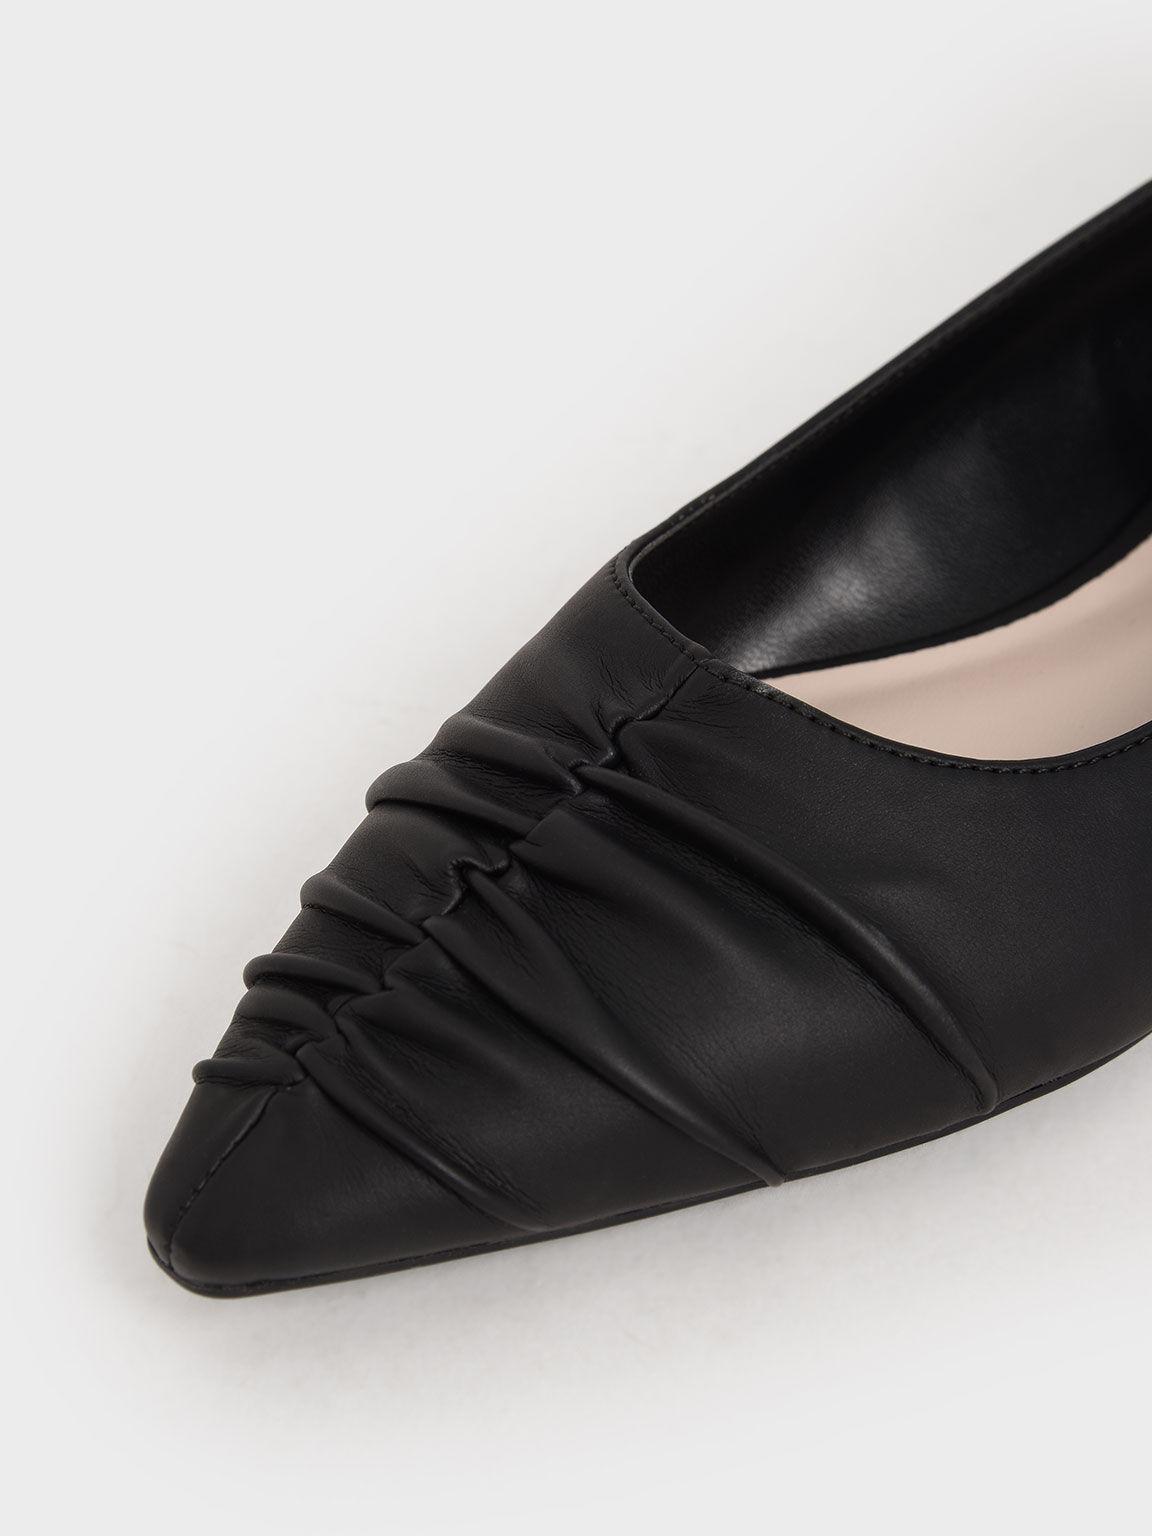 Ruched Ballet Pumps, Black, hi-res